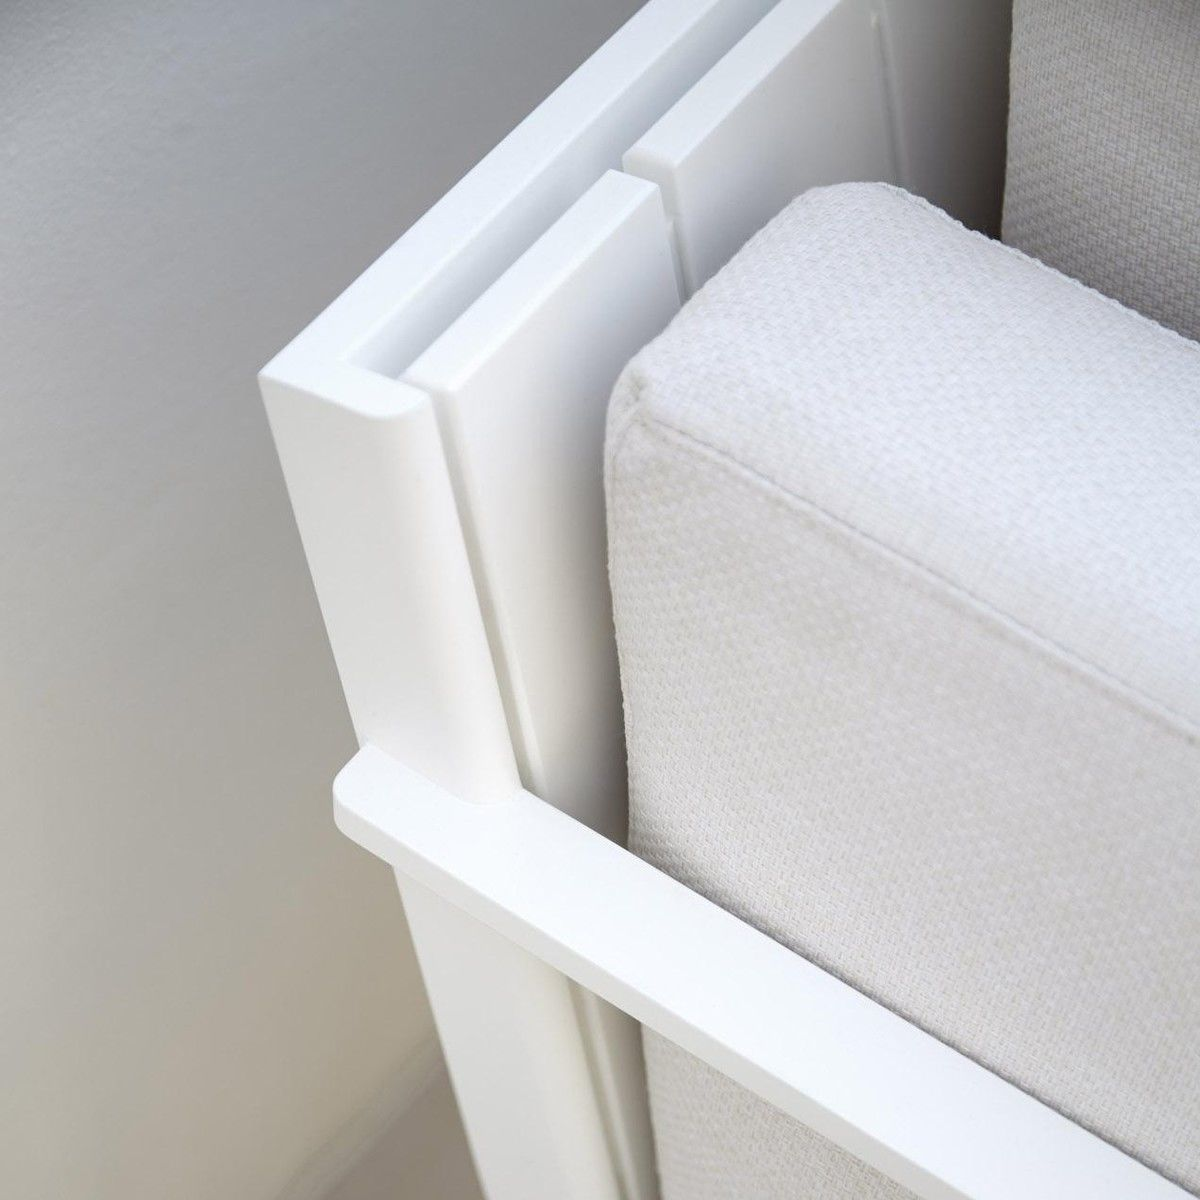 Flat modular chaise longue gandia blasco flat for Chaise longue manufacturers